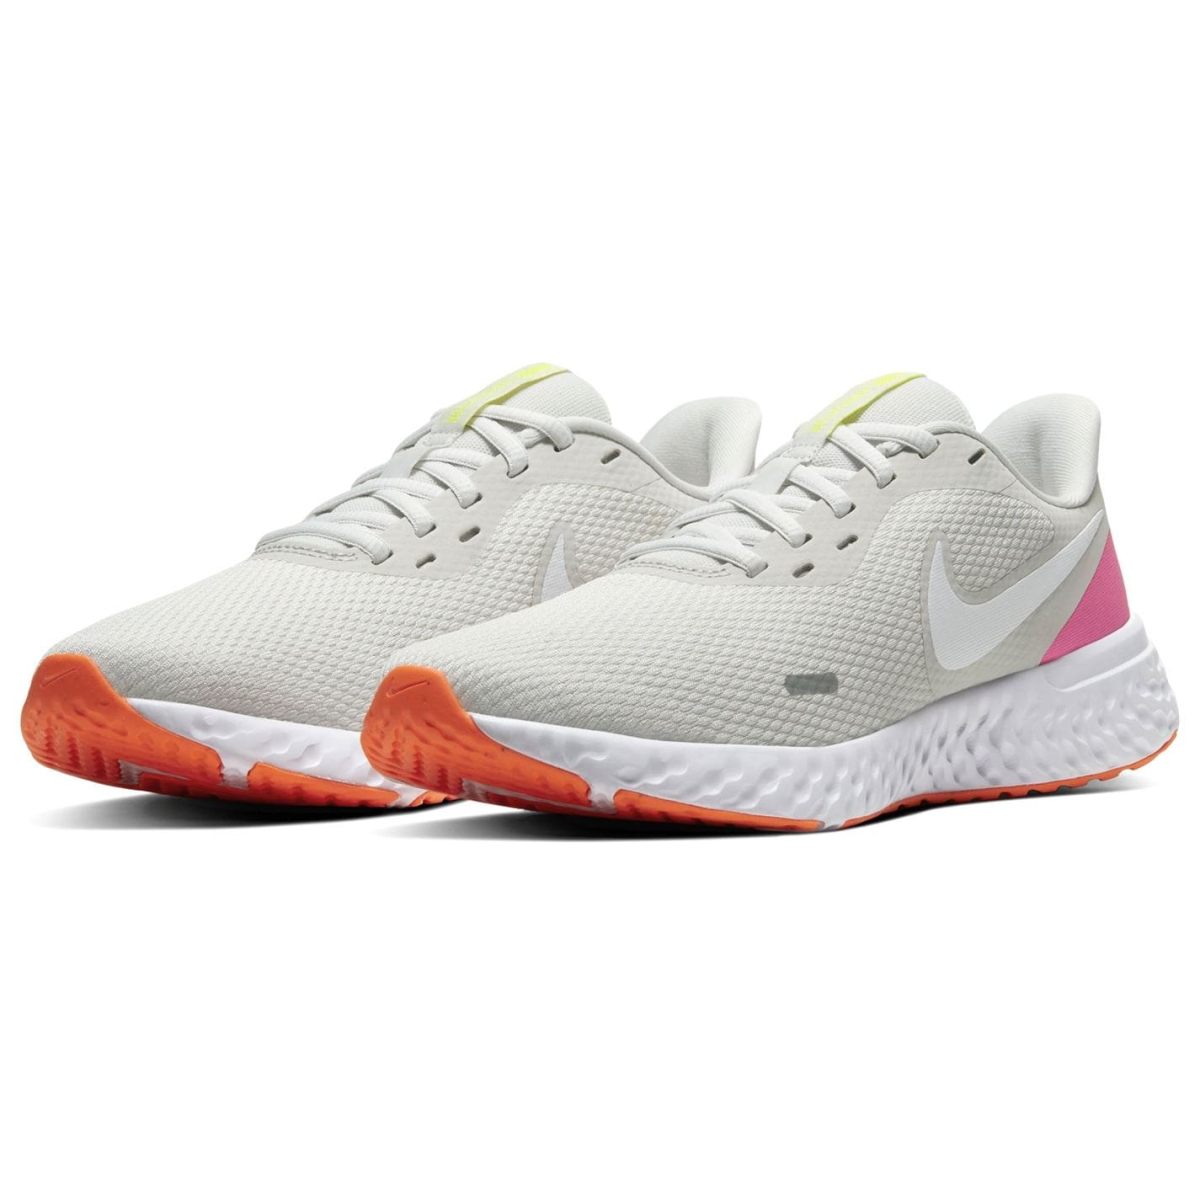 Nike-Revolution-Turnschuhe-Damen-Sneaker-Sportschuhe-Laufschuhe-1160 Indexbild 31